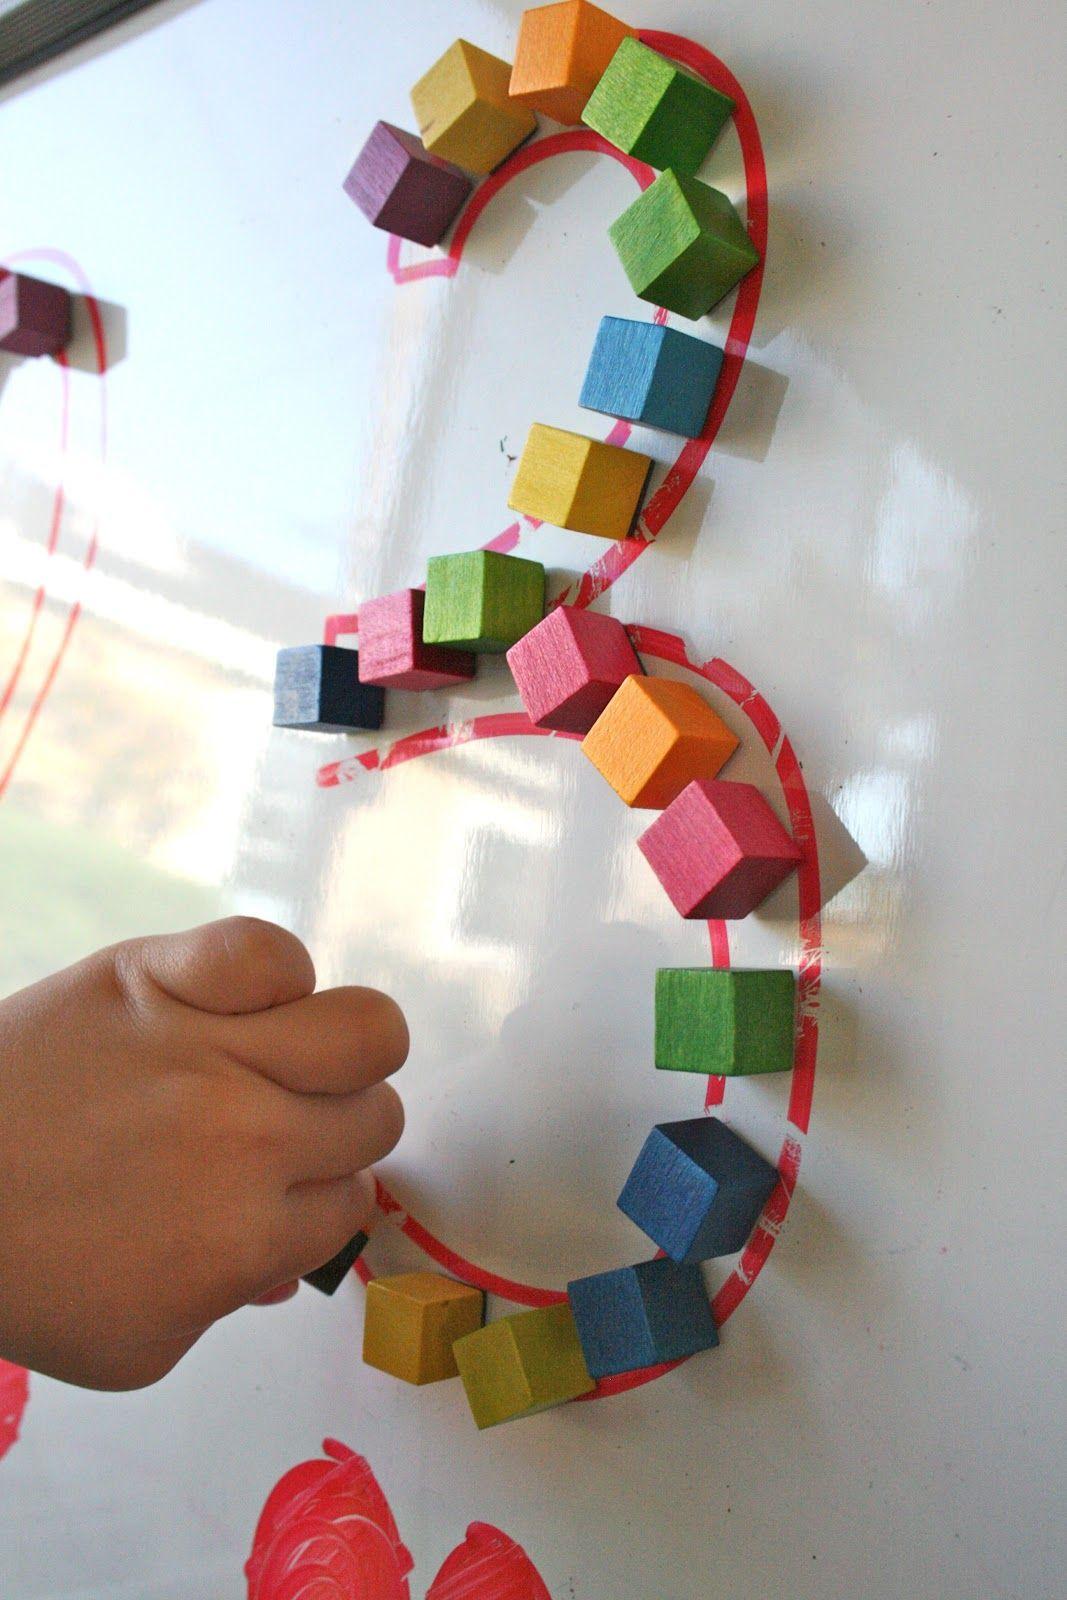 The Moffatt Girls Toddler Tasks Week 7